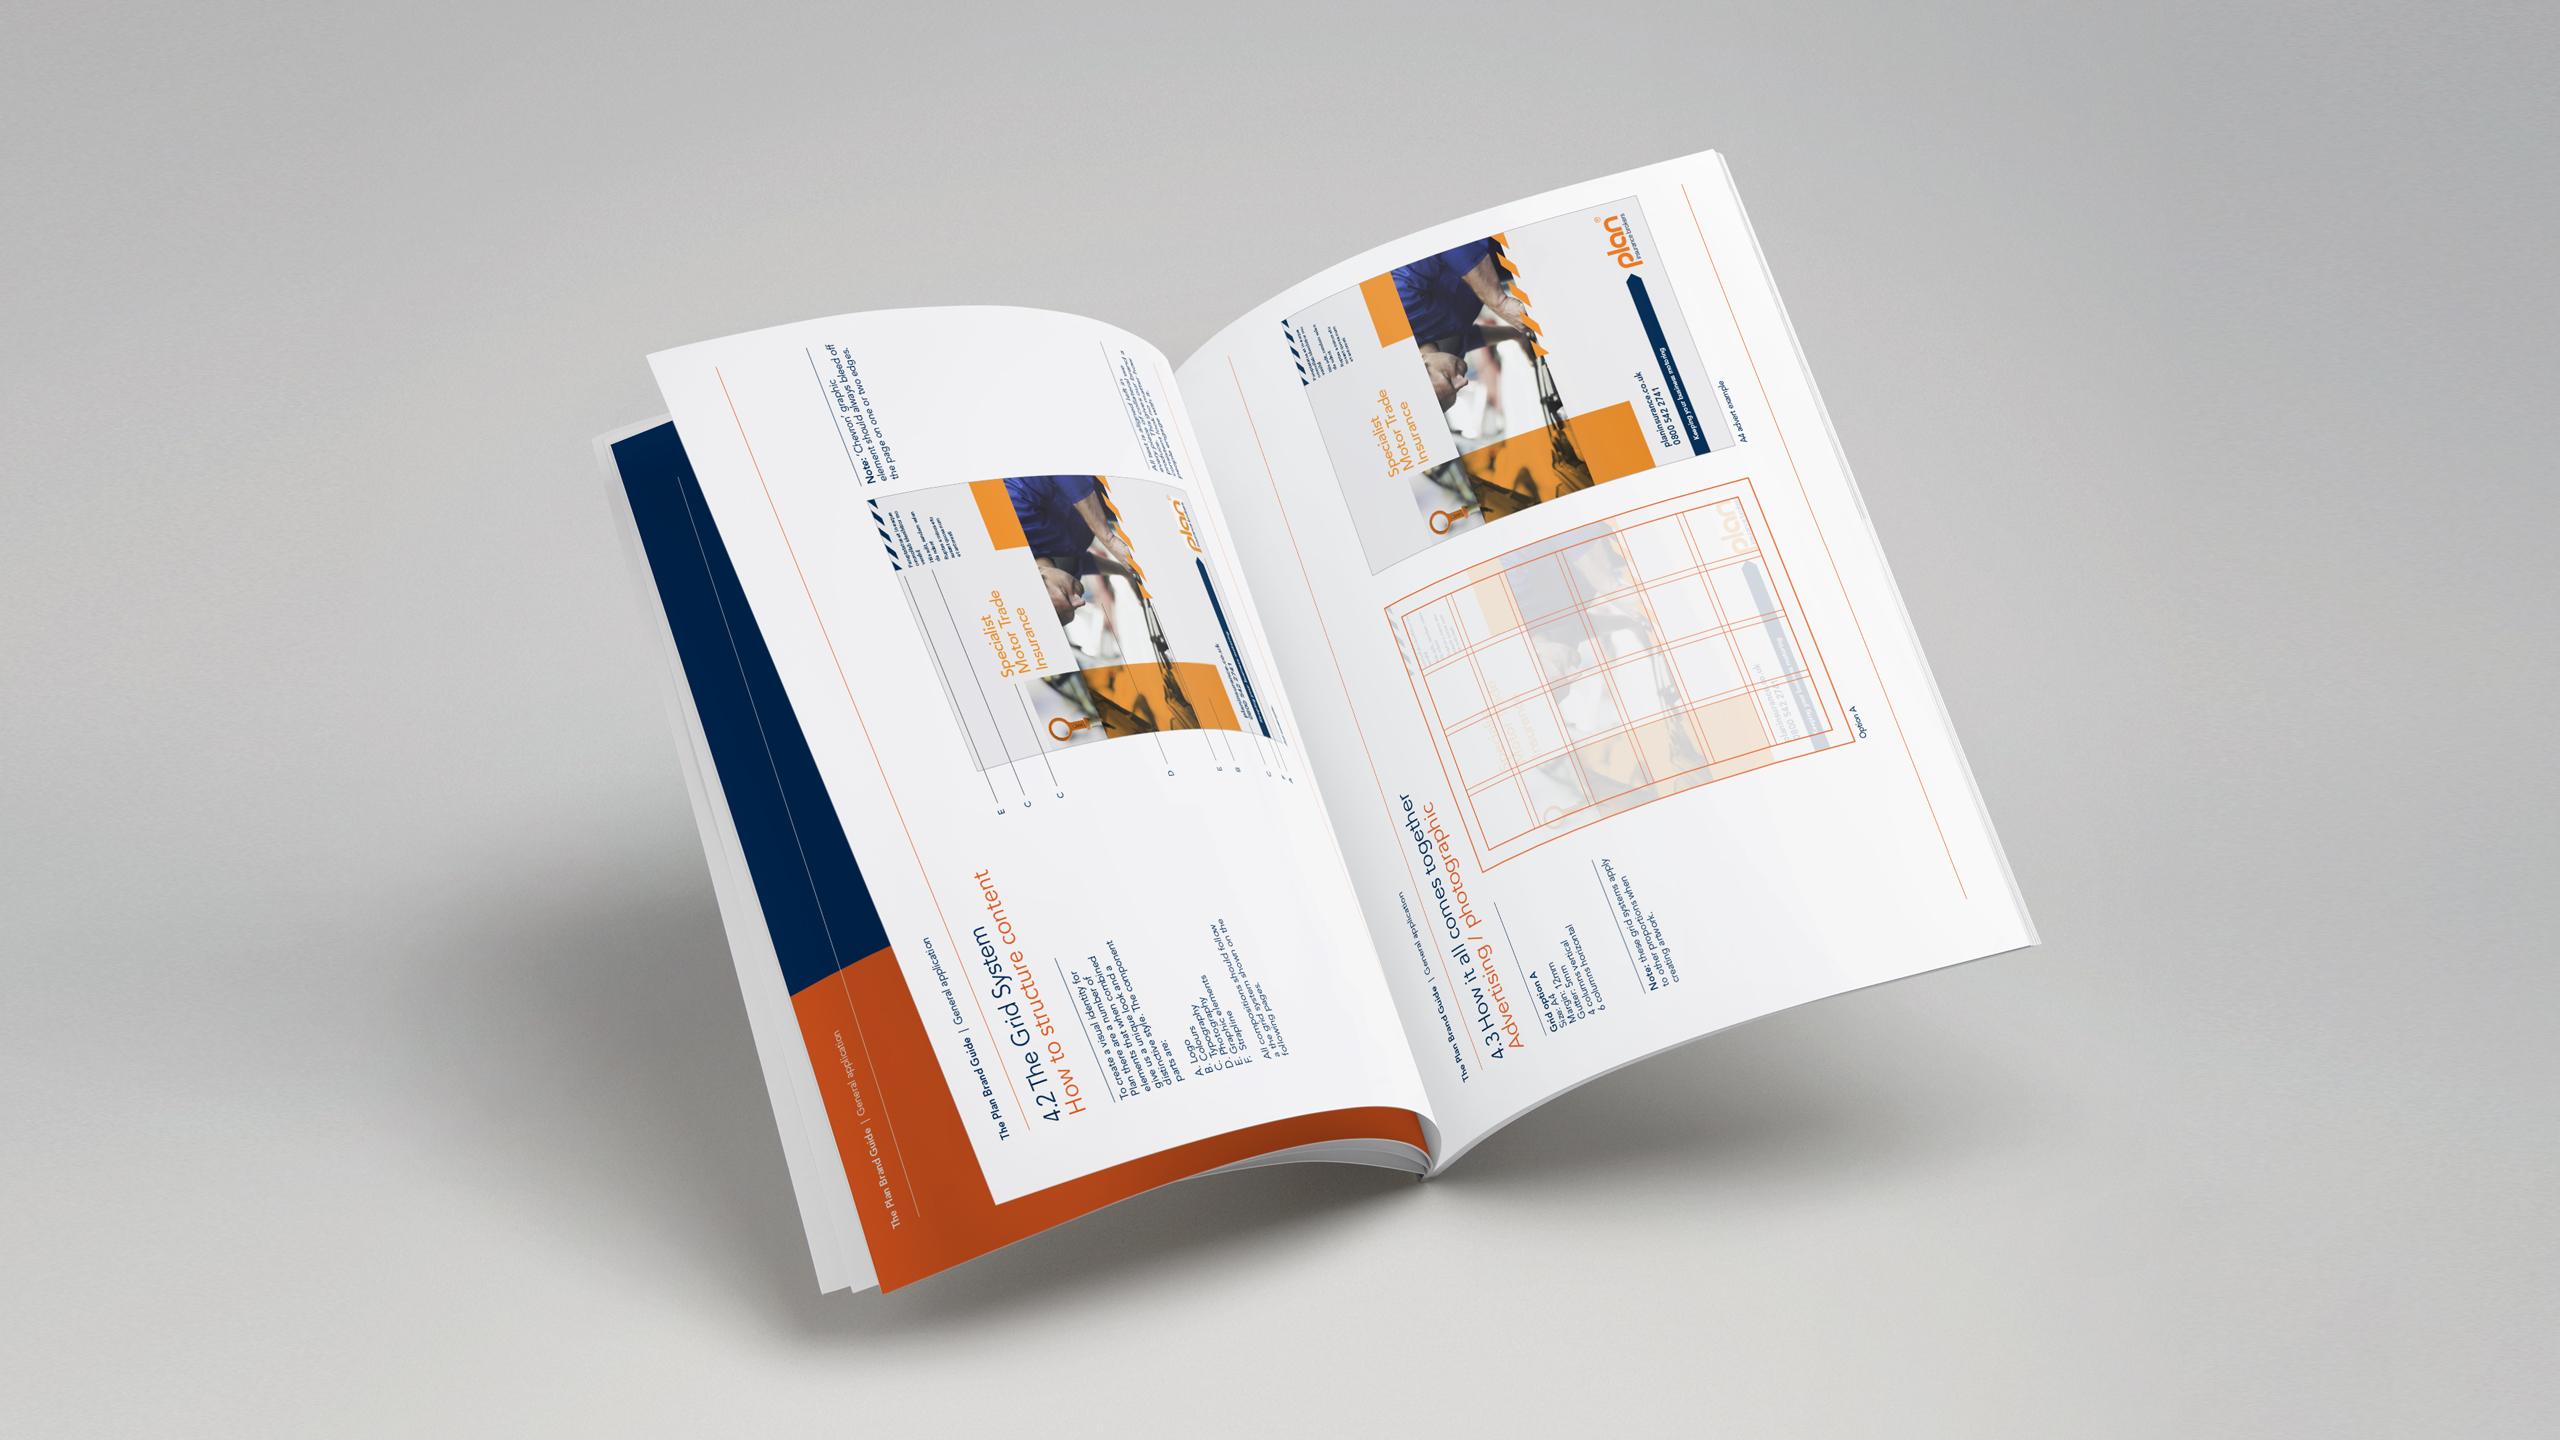 Plan Insurance rebrand by VGROUP